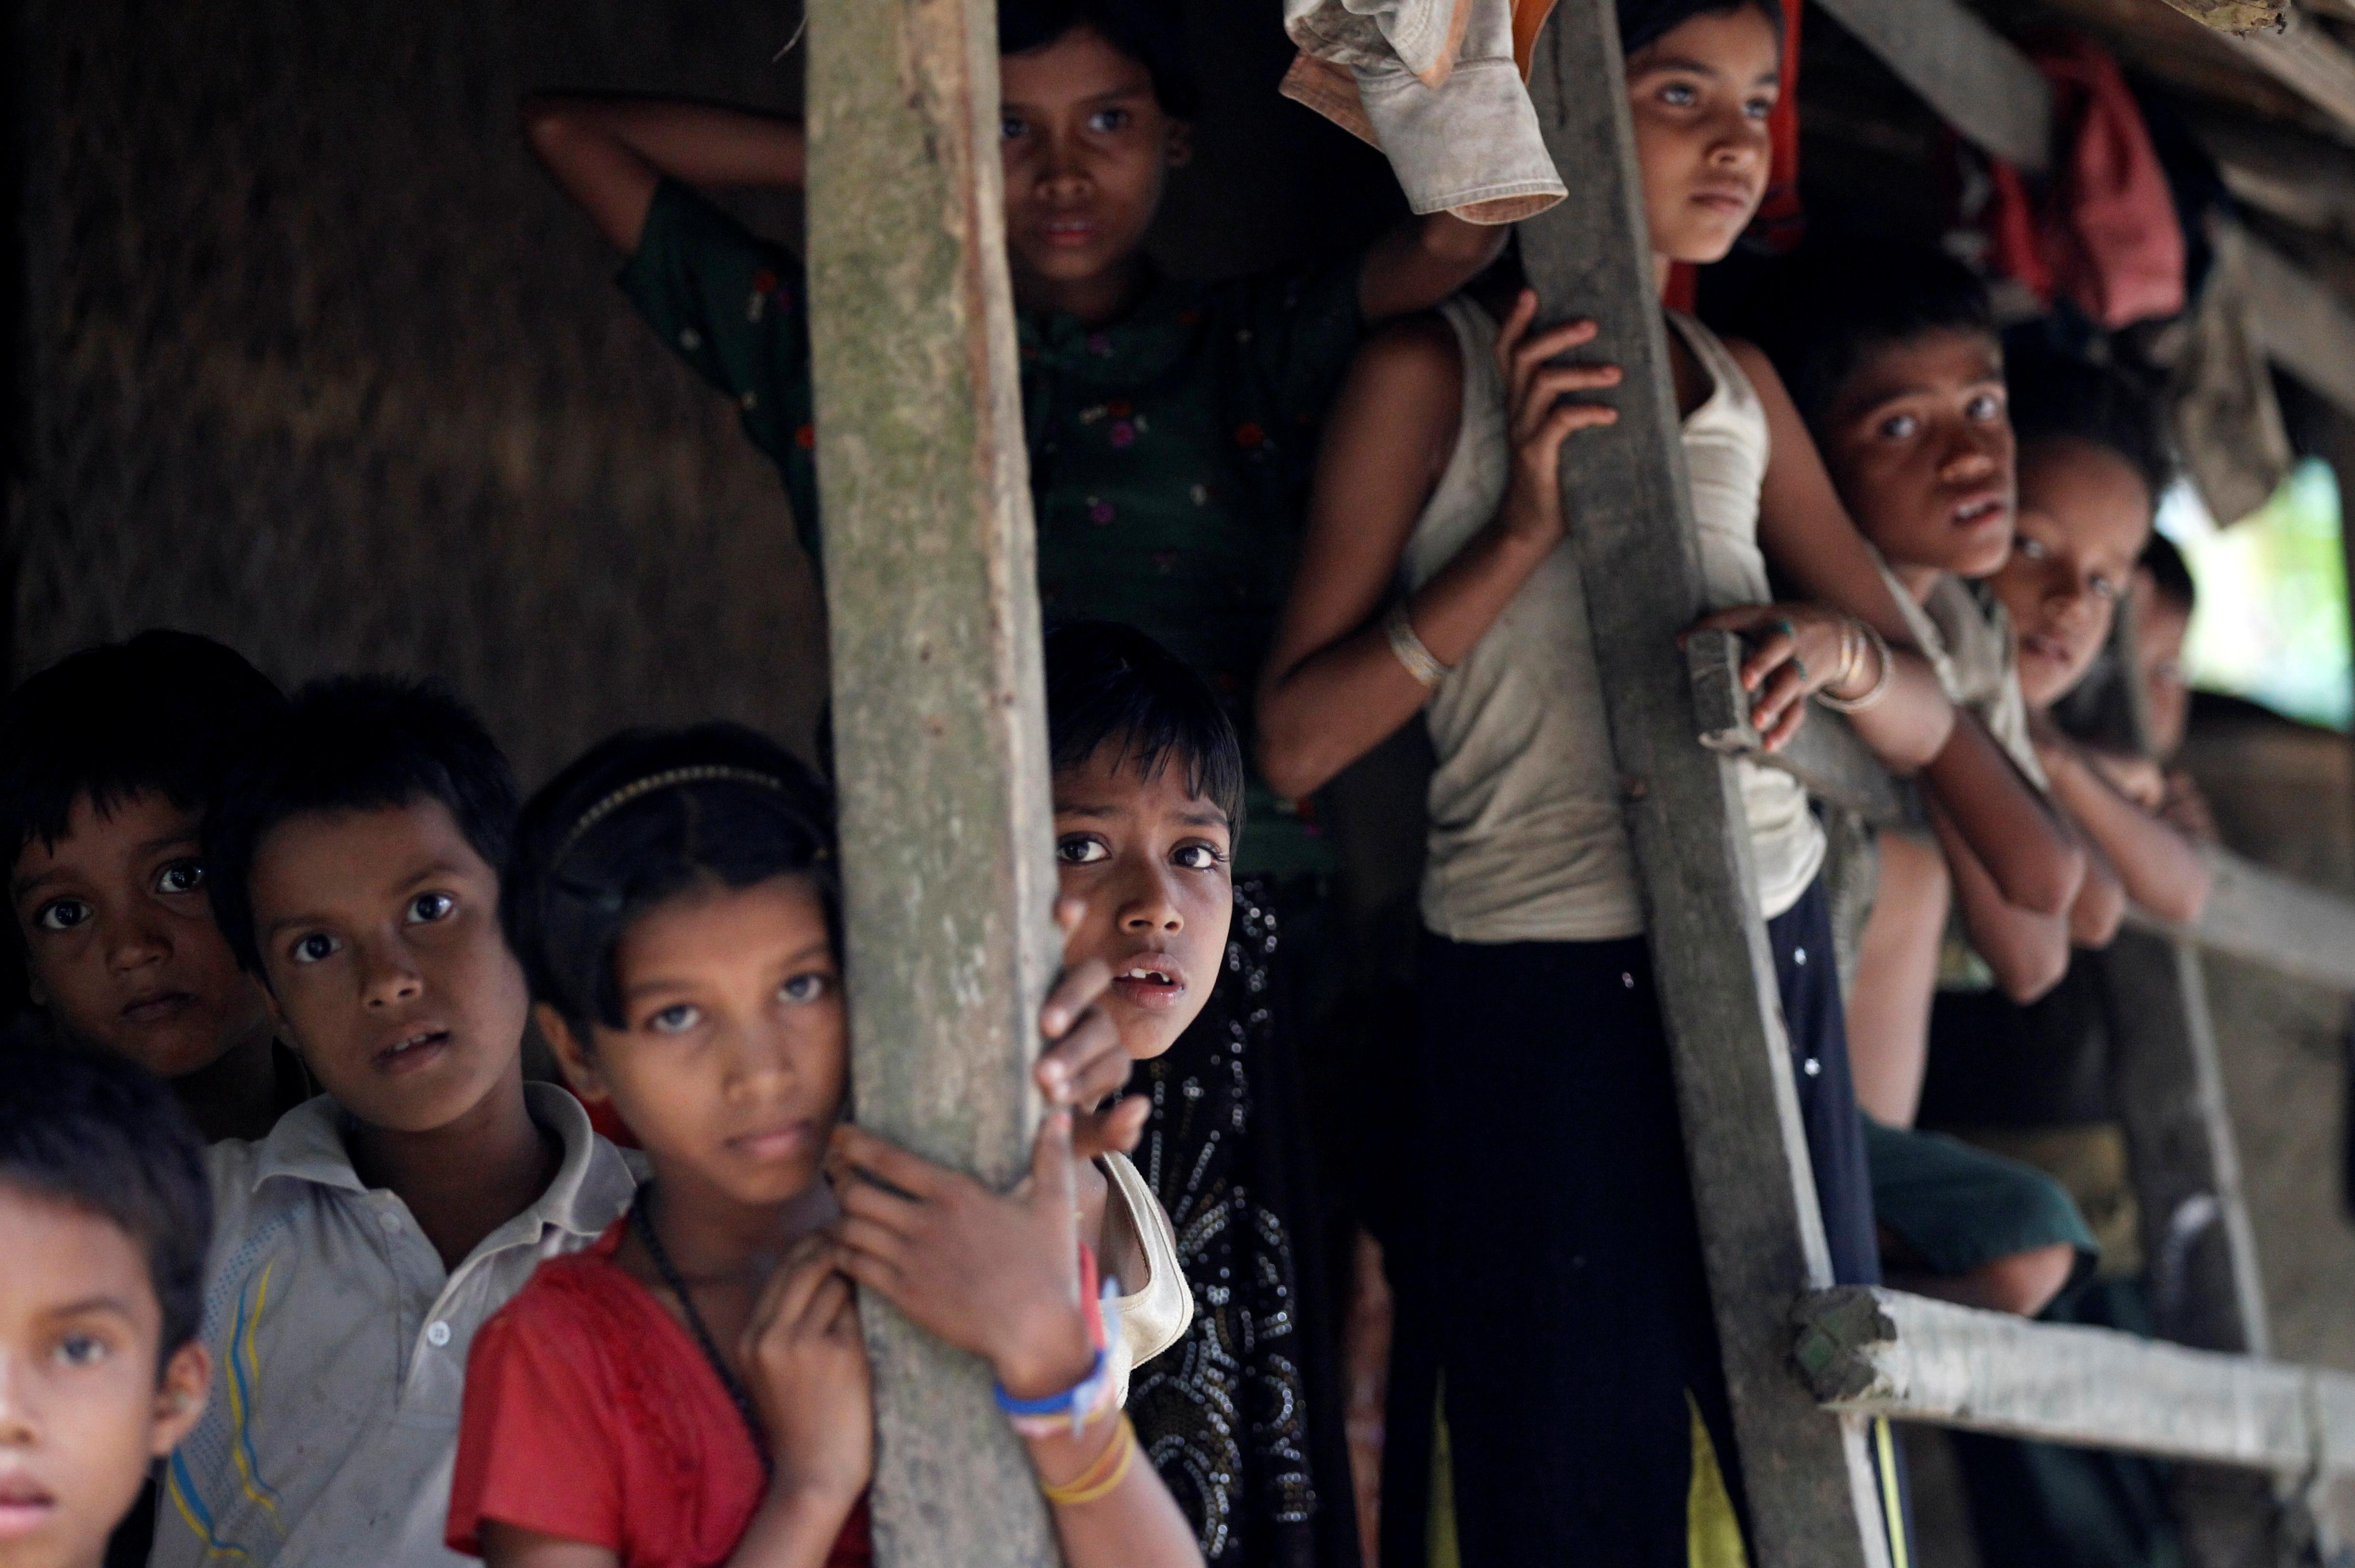 Rohingya Muslim children stand in U Shey Kya village, outside Maungdaw, in Burma's Rakhine state, on Oct. 27, 2016